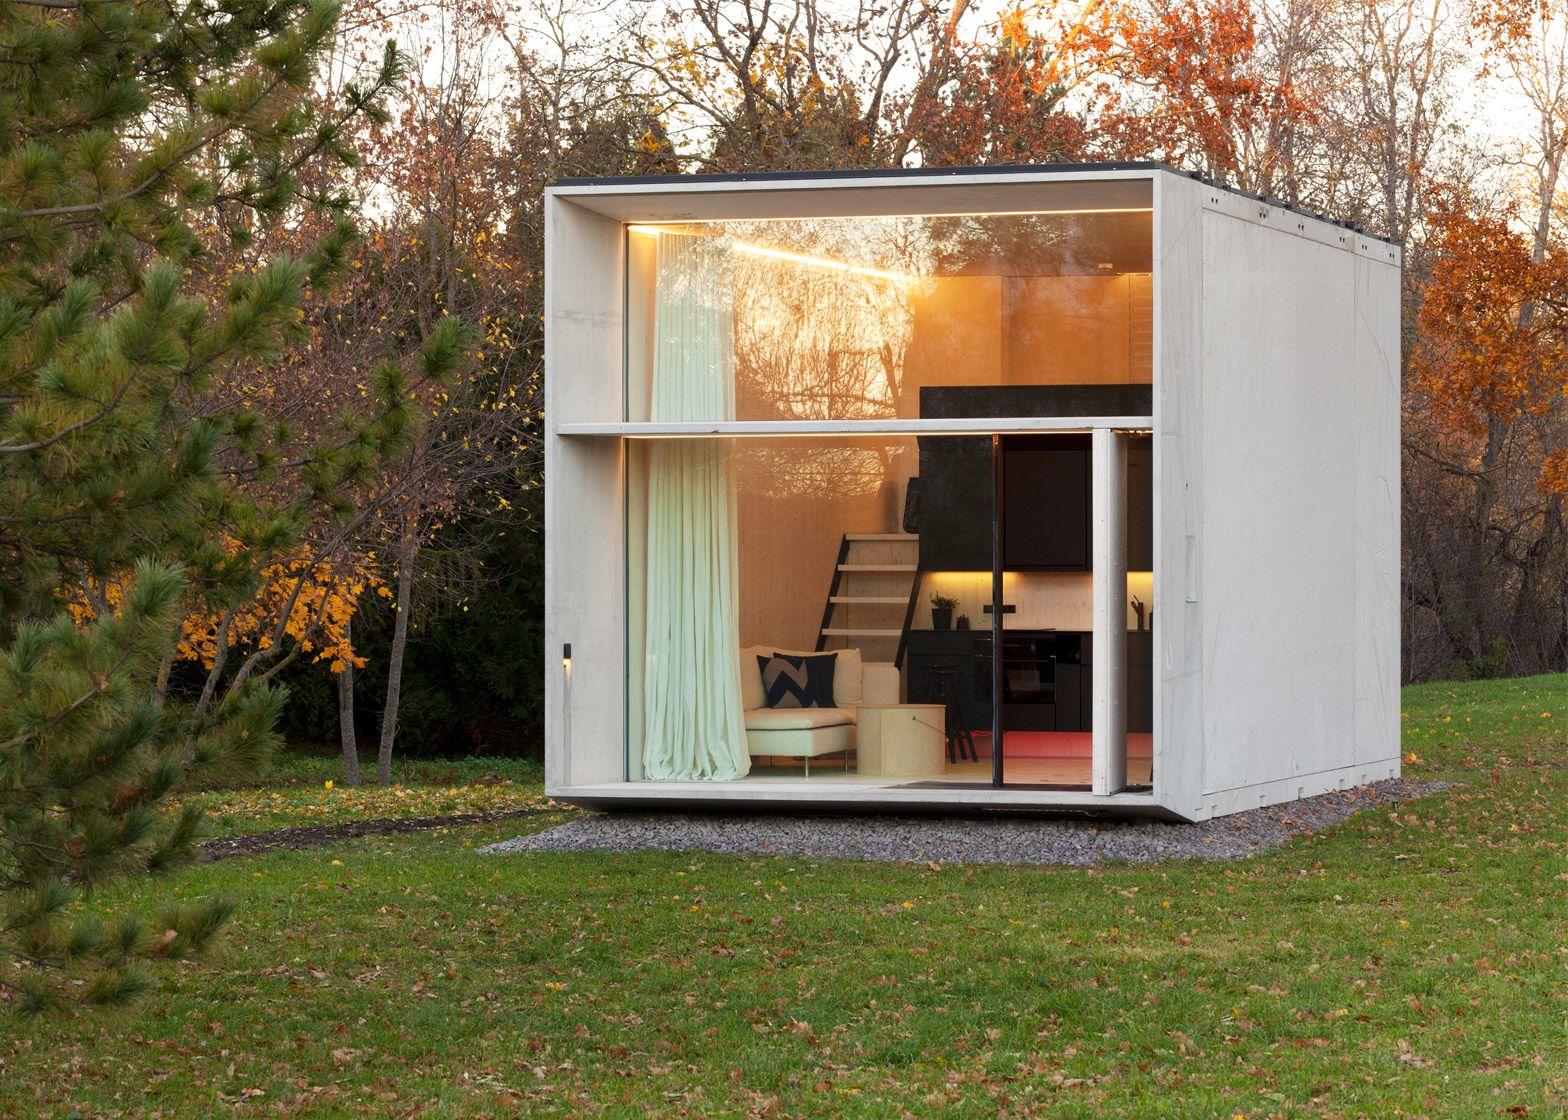 KODA Prefab Brings Factory Quality And Modern Design To Tiny - Modern design prefab homes